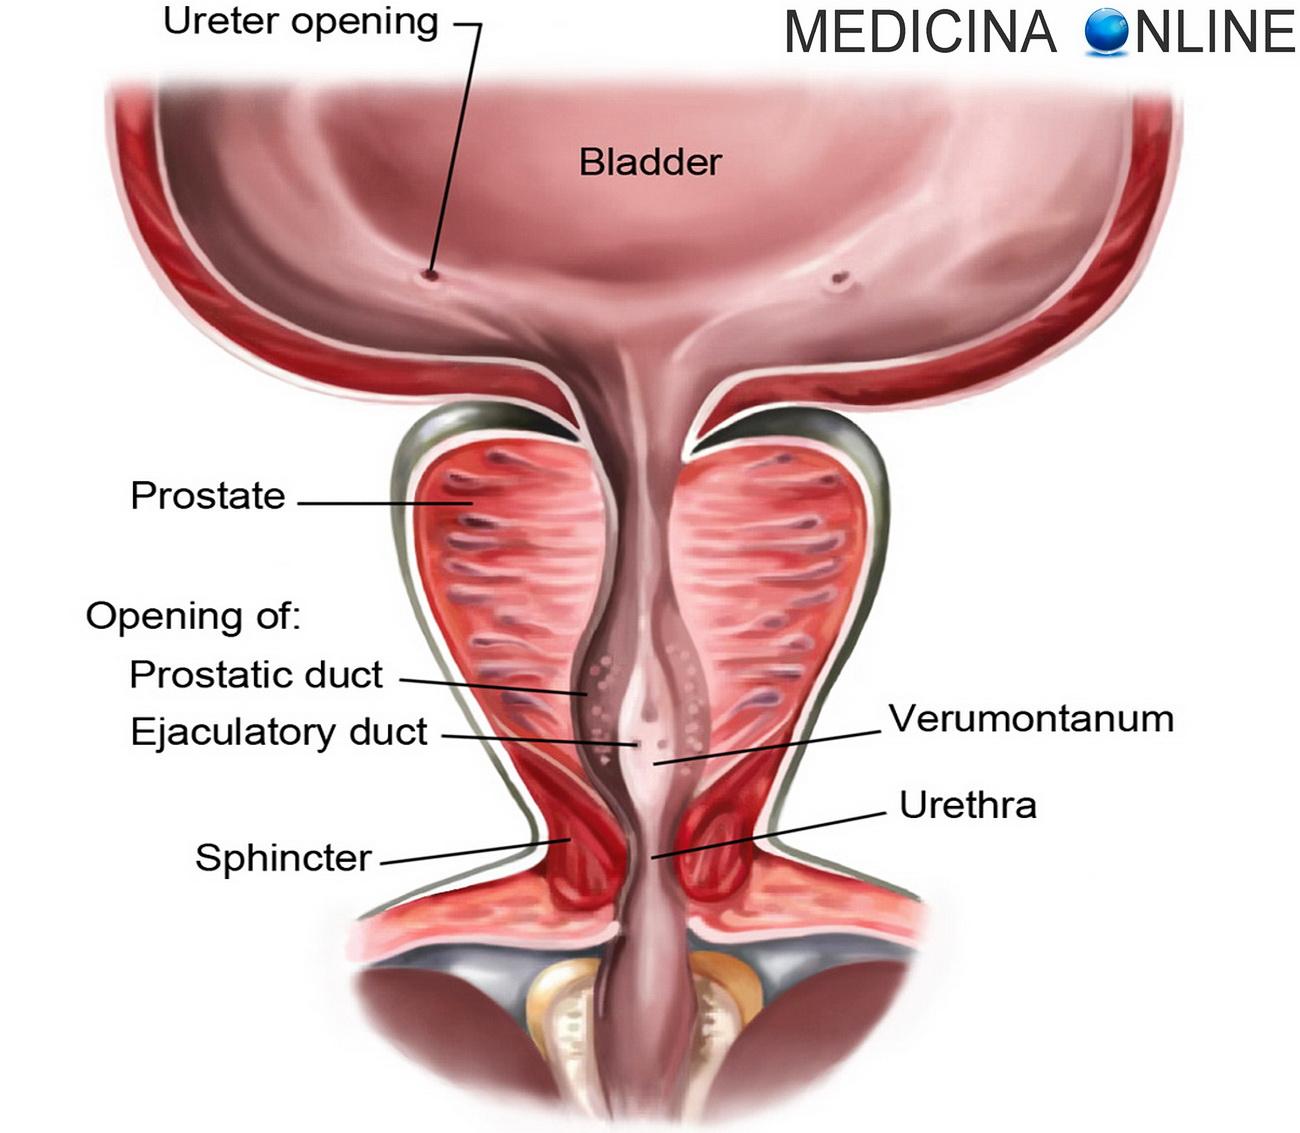 prostatite cronica sintomi e cause 2